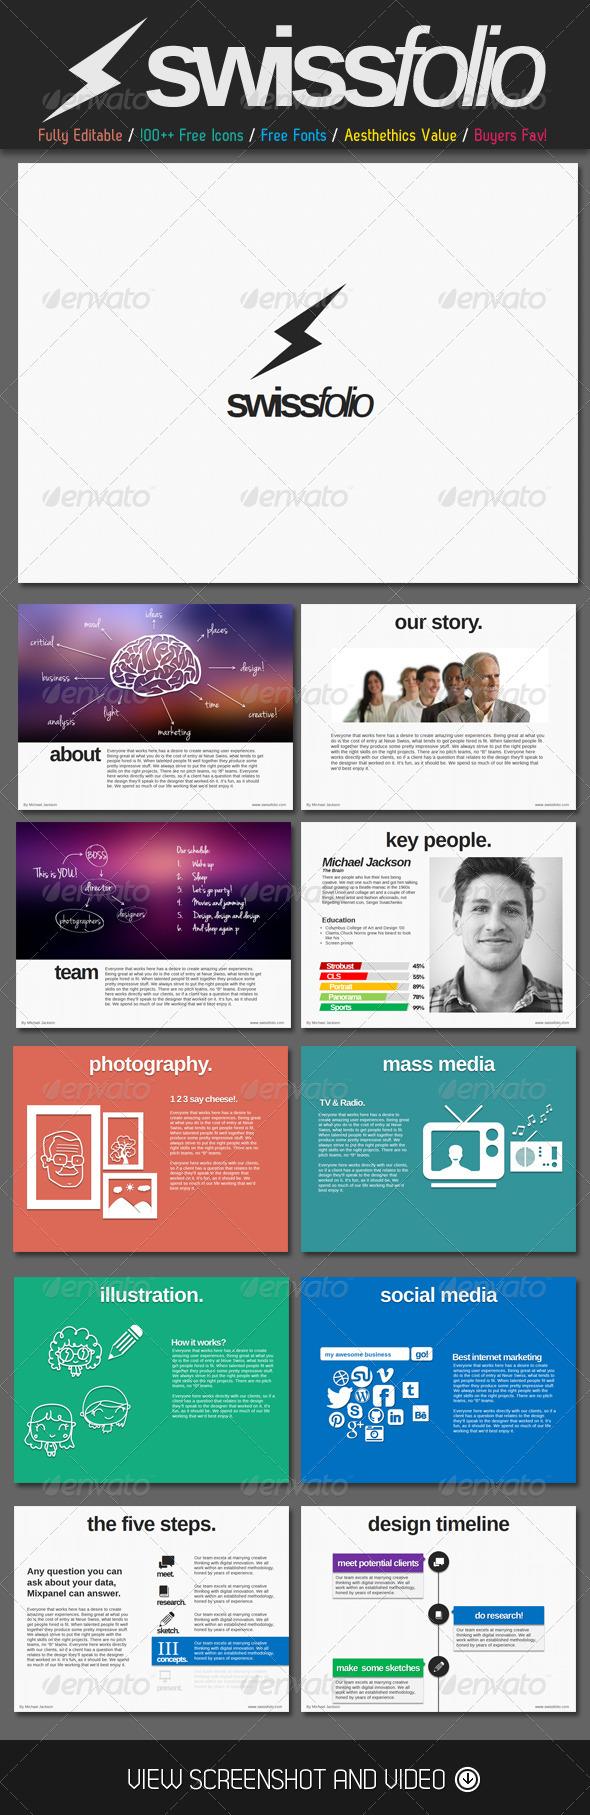 swiss folio powerpoint template   presentations   pinterest, Graphicriver Folio Powerpoint Presentation Template, Presentation templates